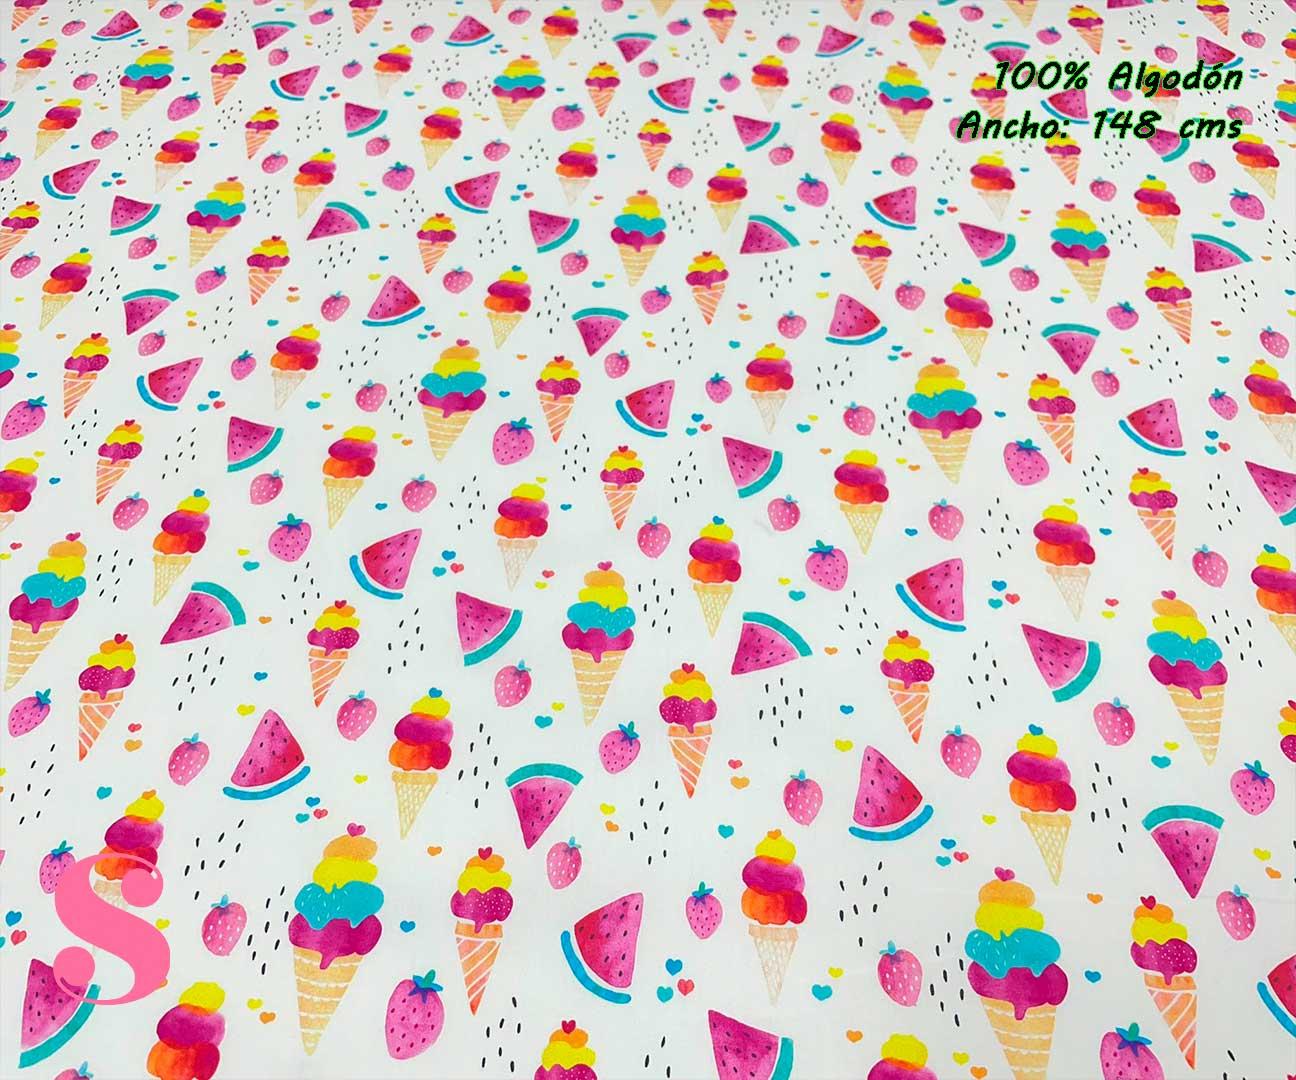 61-telas-estampadas-de-algodón,-telas-floreadas,estampados-floreados-de-algodón,estampados-origonales-de-algodón,Tejido Estampado Summer